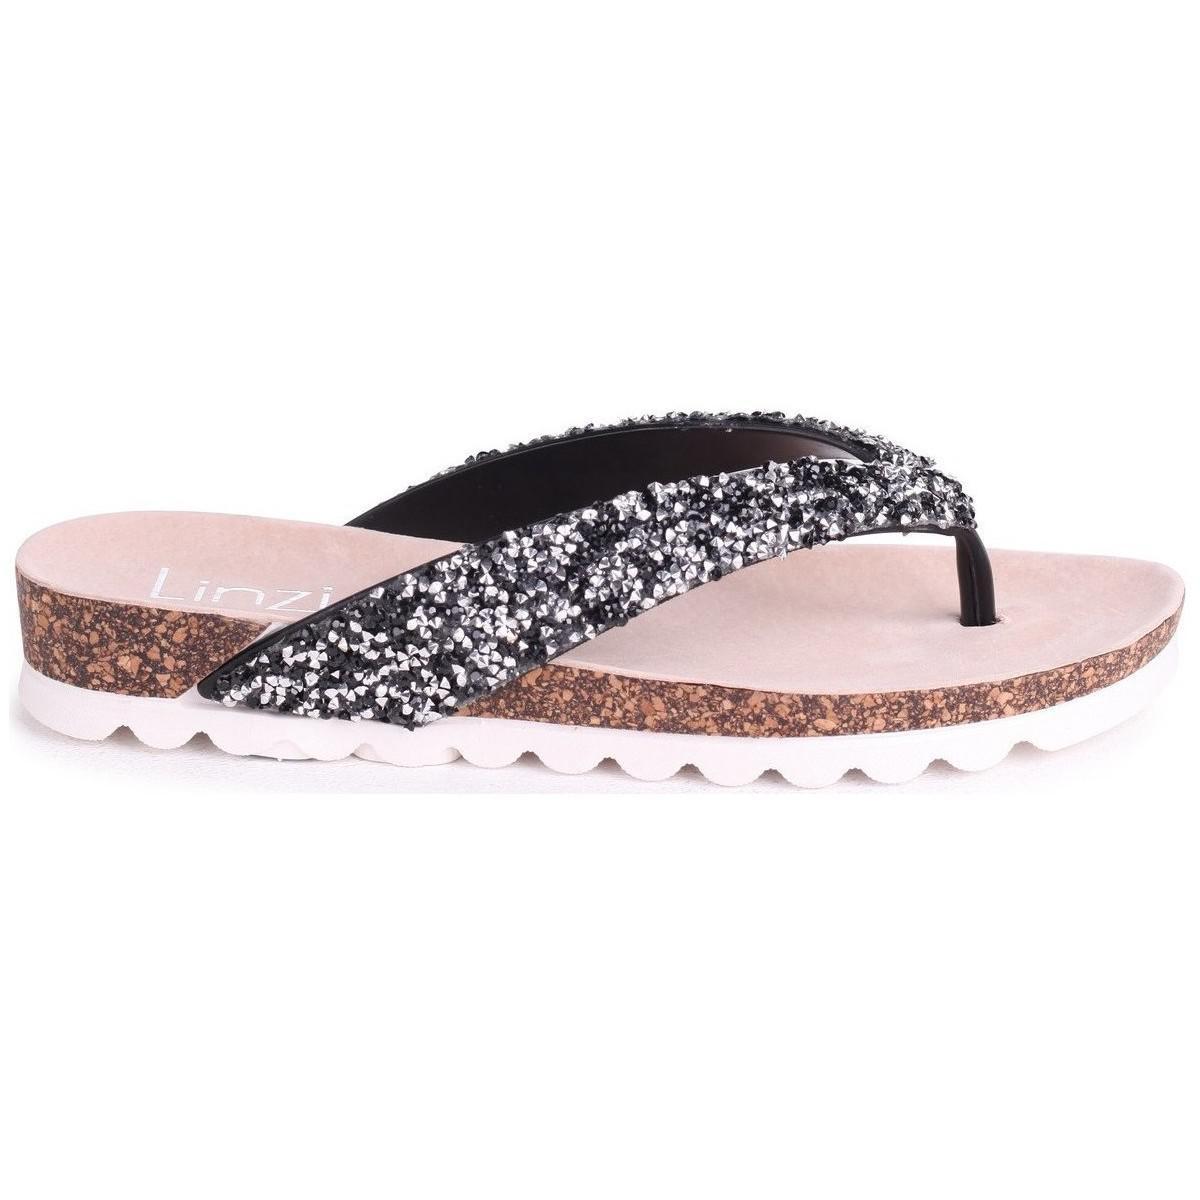 f7630c672 Linzi Jana Women s Sandals In Black in Black - Lyst